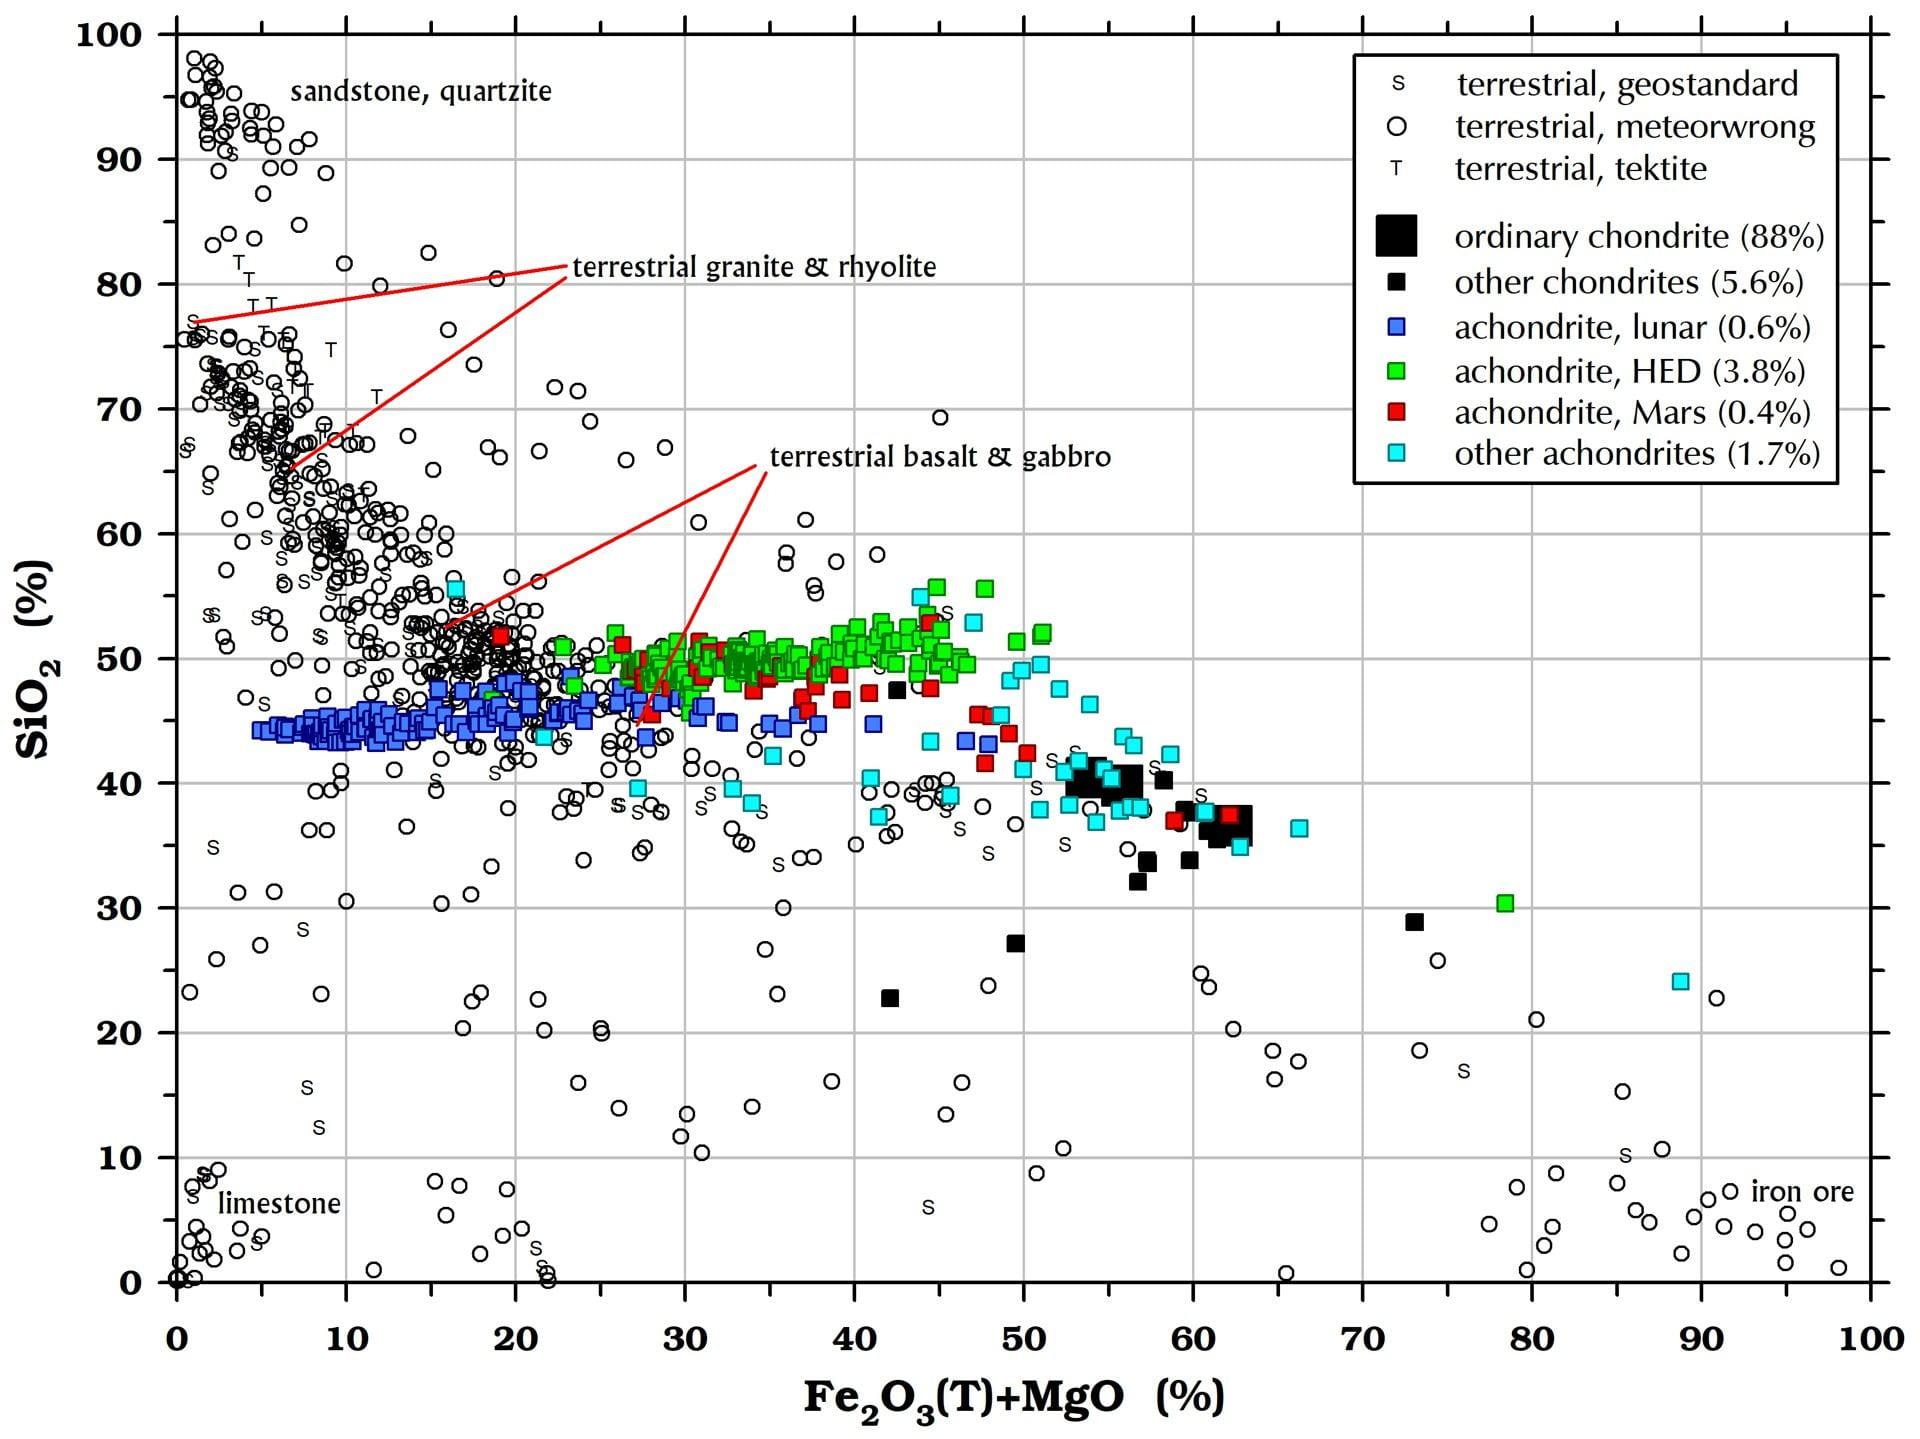 Sodium (SiO2) in meteorites and terrestrial rocks